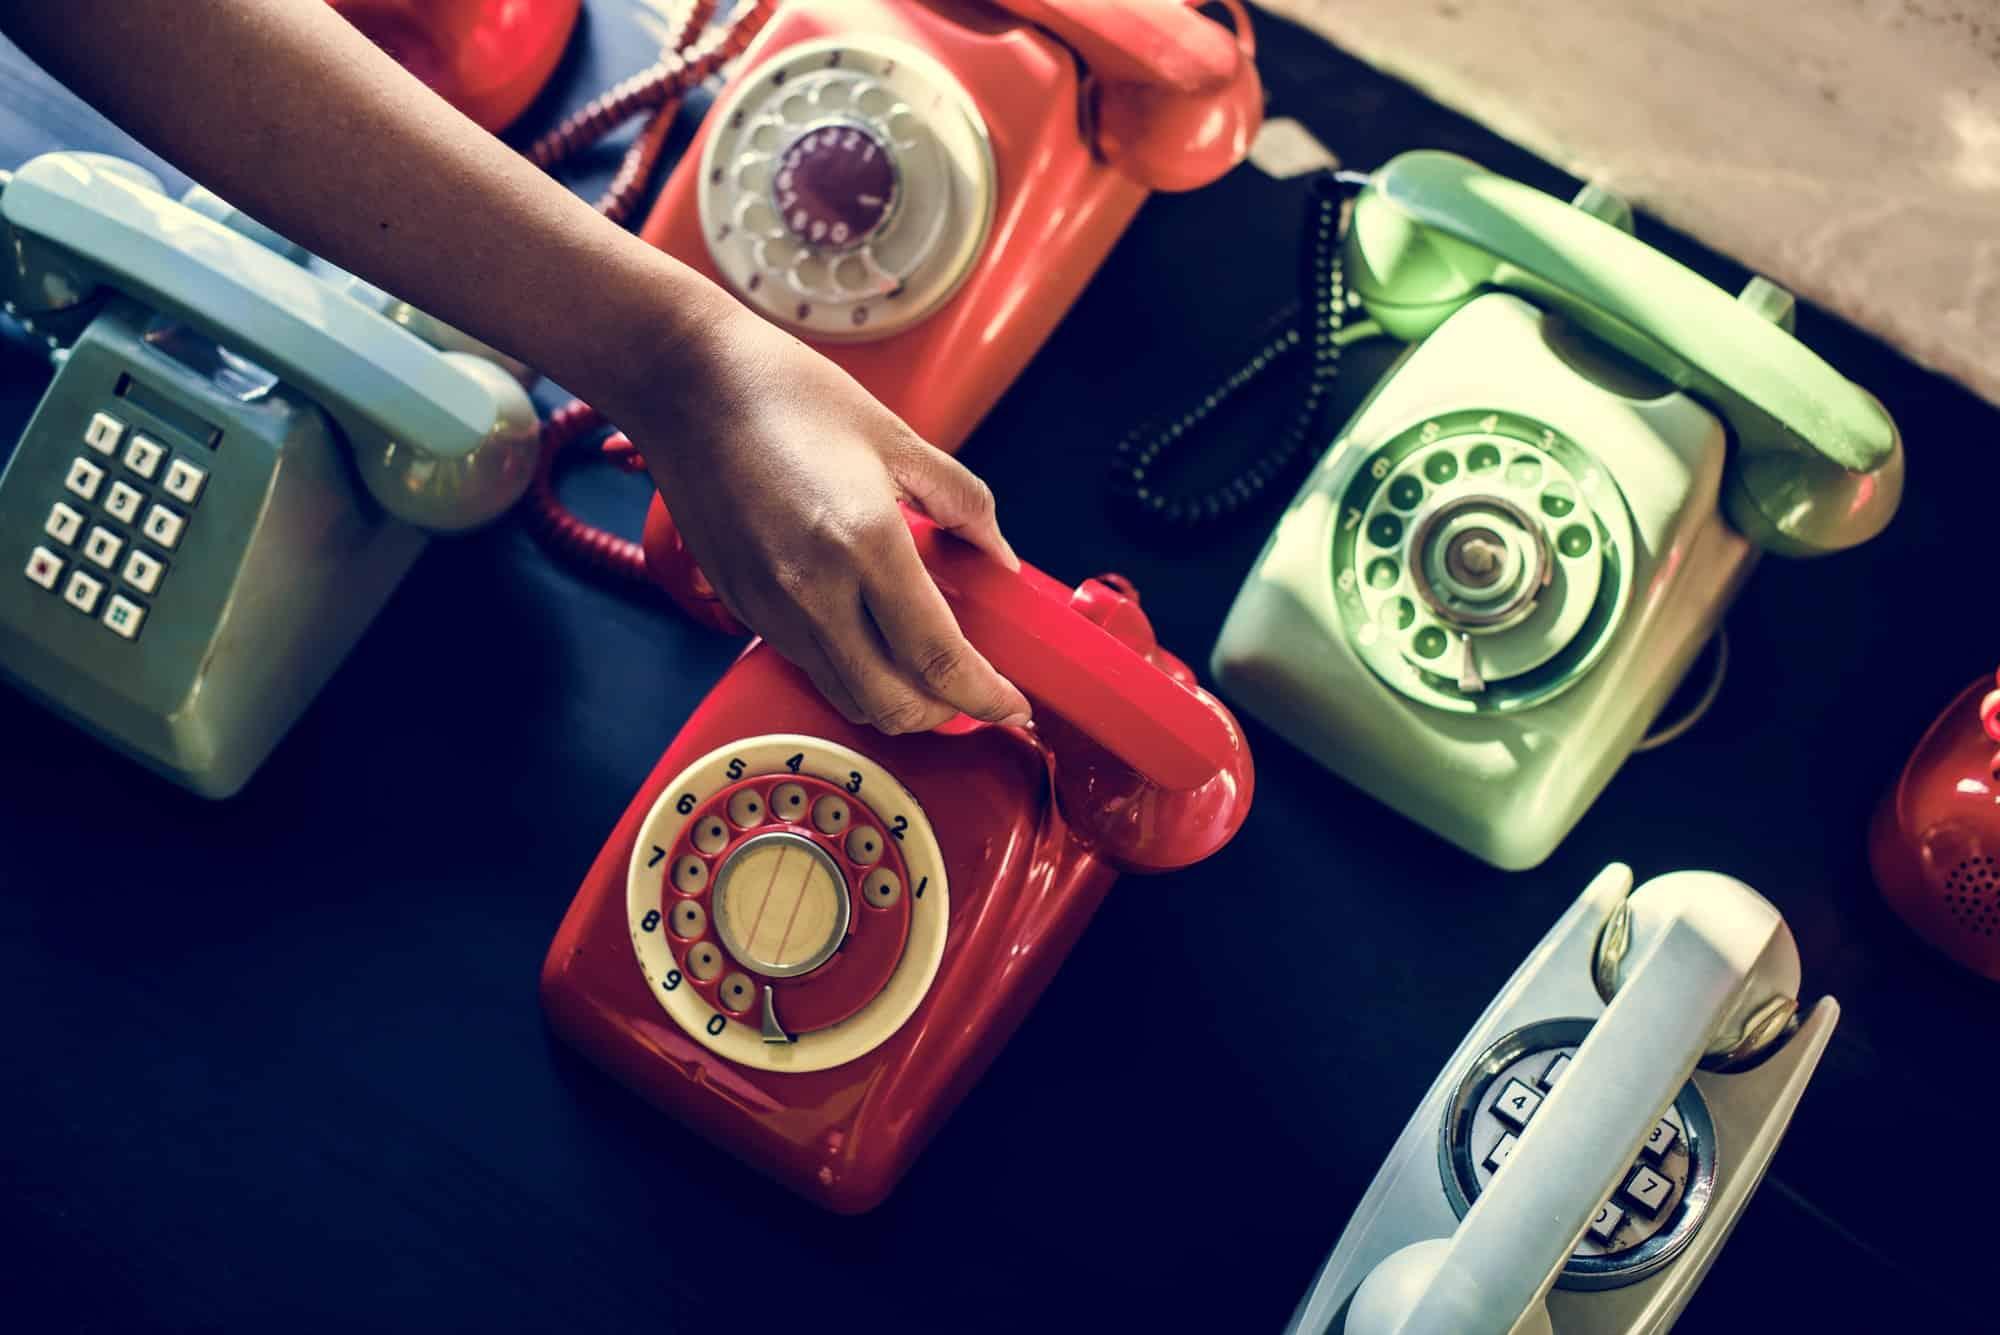 telephone call tracking